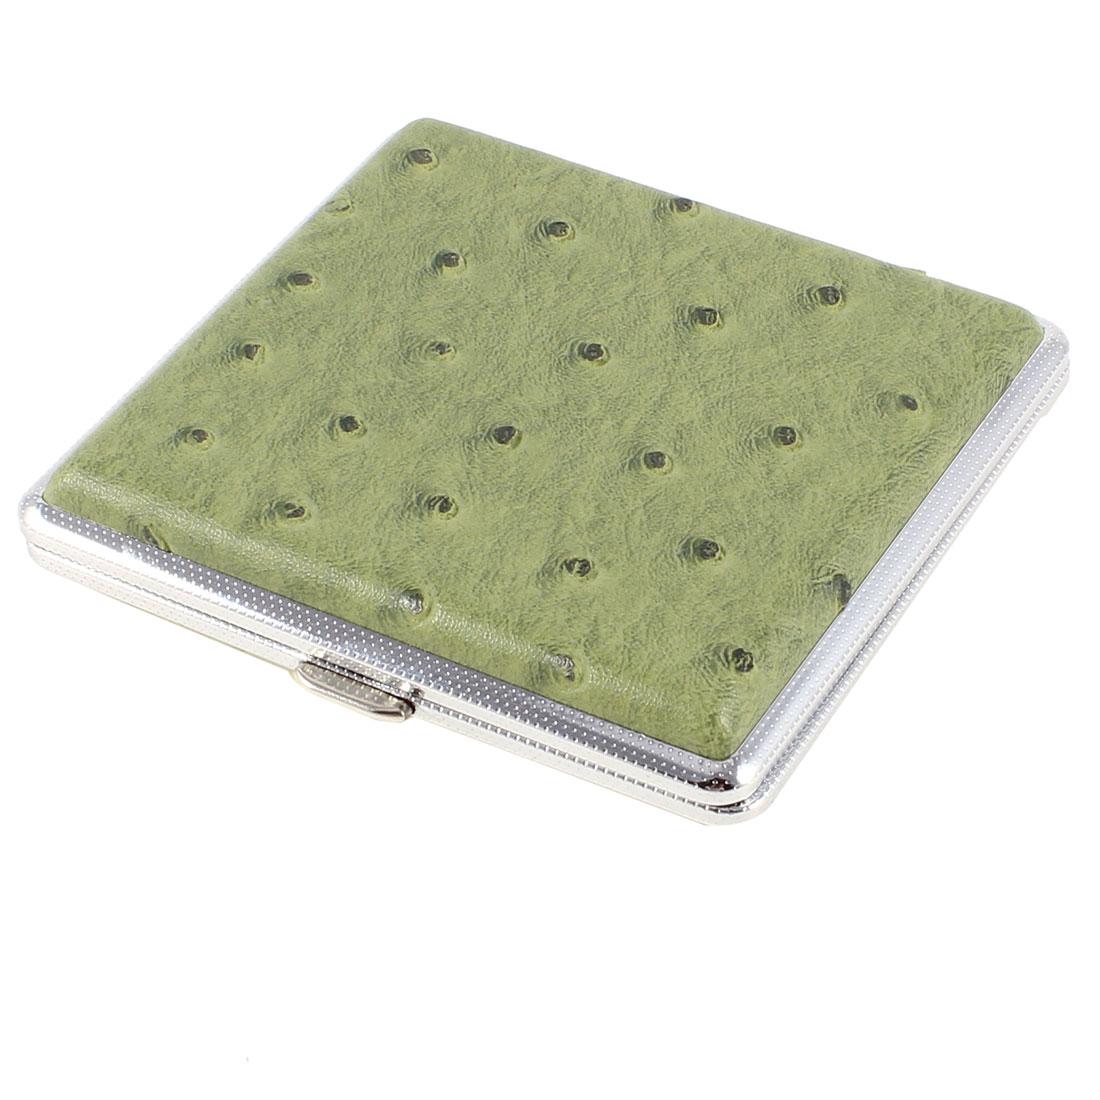 Man Dotty Crocodile Pattern Metal Tobacco Cigarette Case Box Olive Green